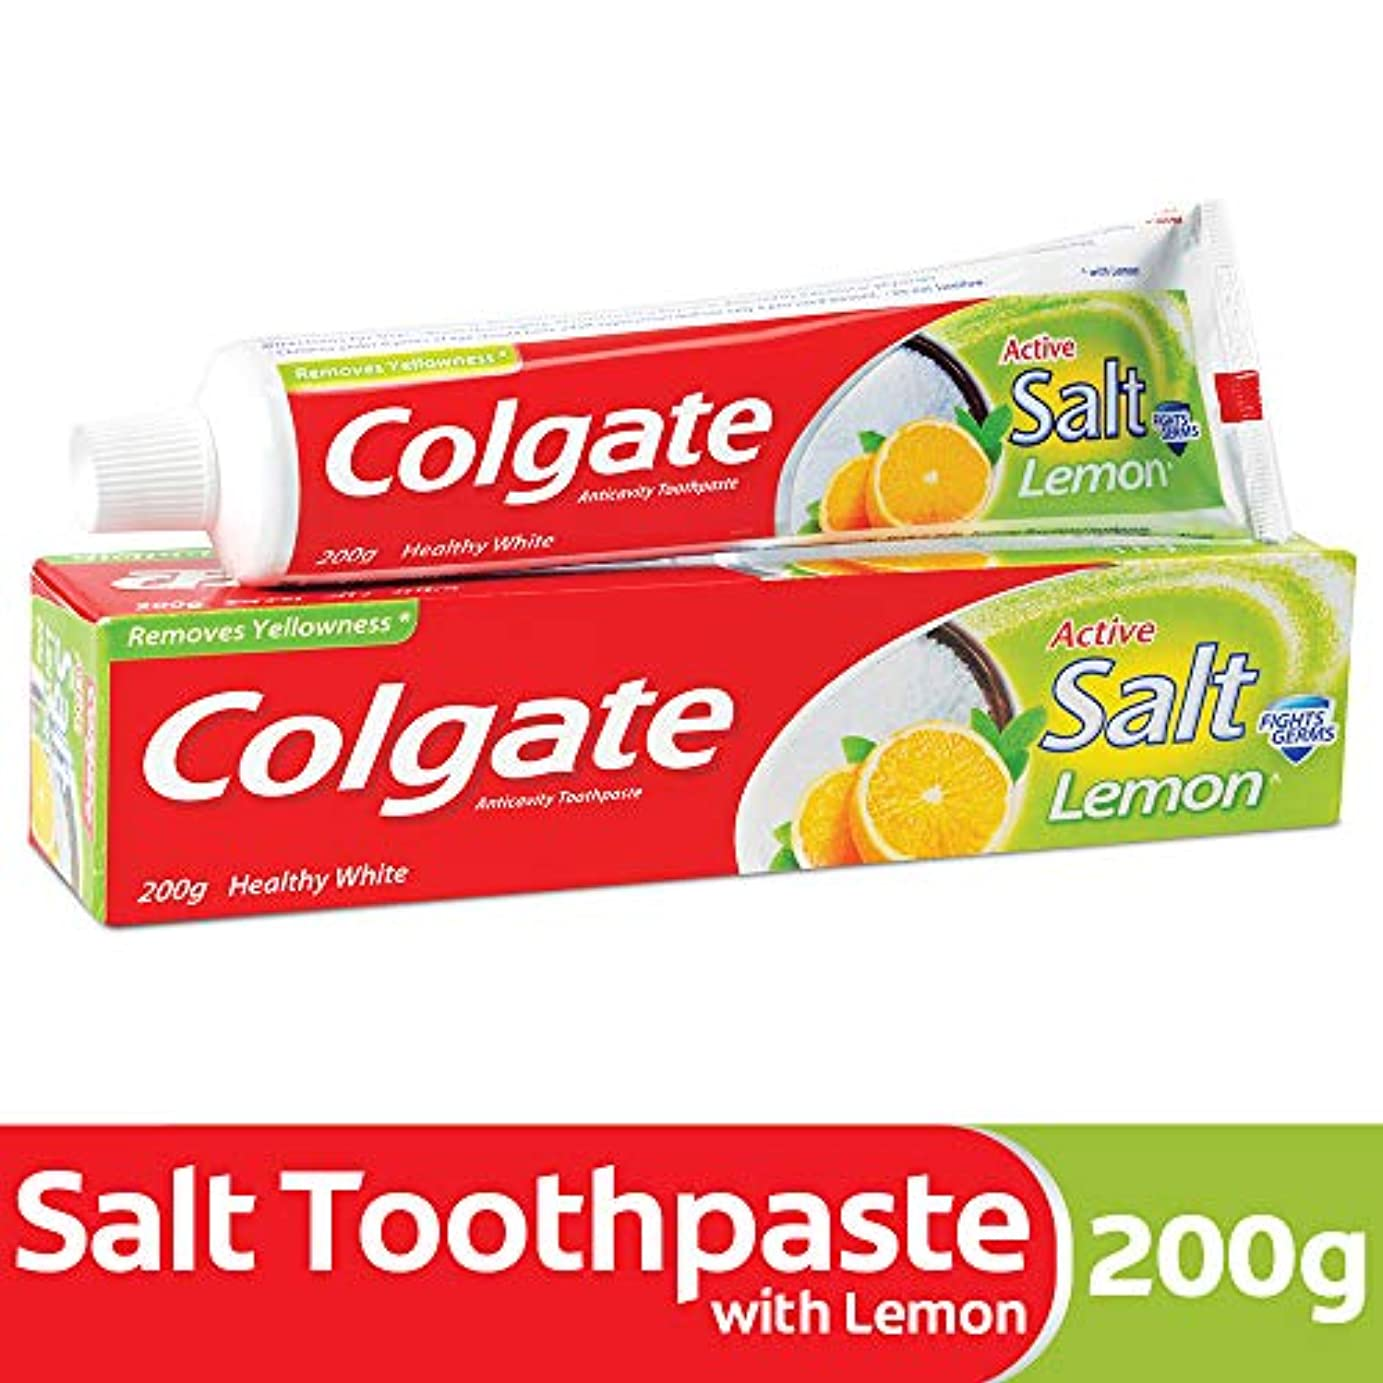 陰謀約設定手Colgate Toothpaste Active Salt - 200 g (Salt and Lemon)